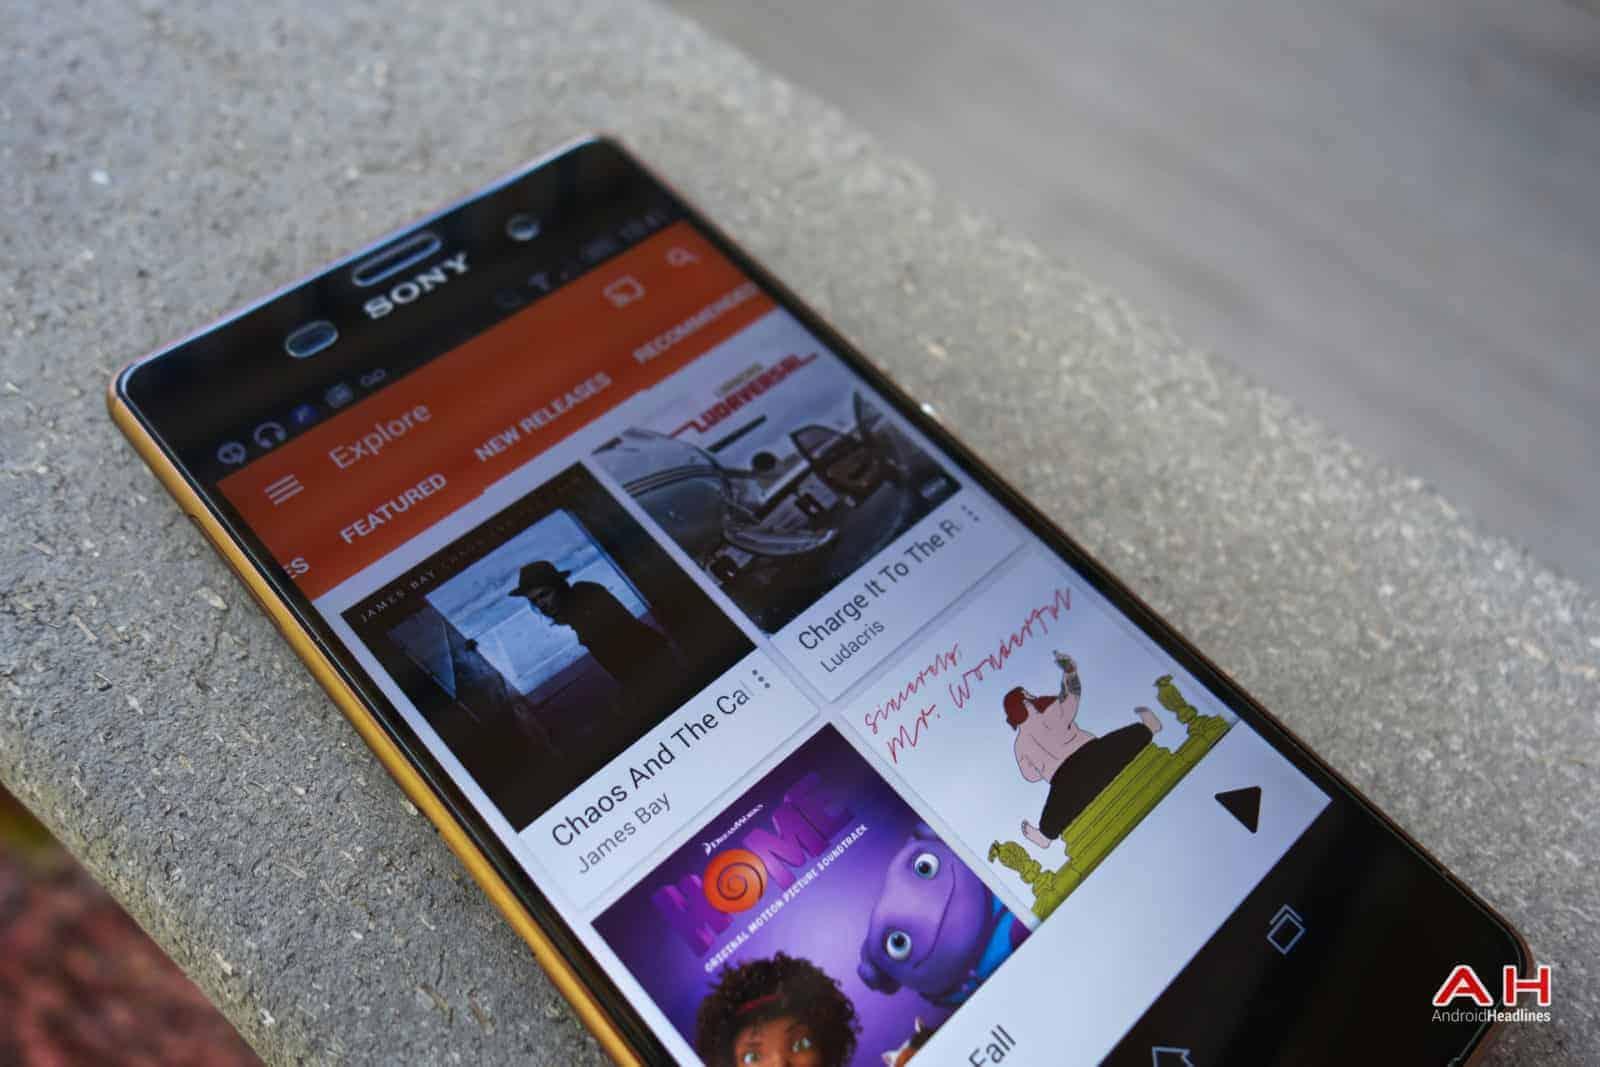 AH Google Play Music-2